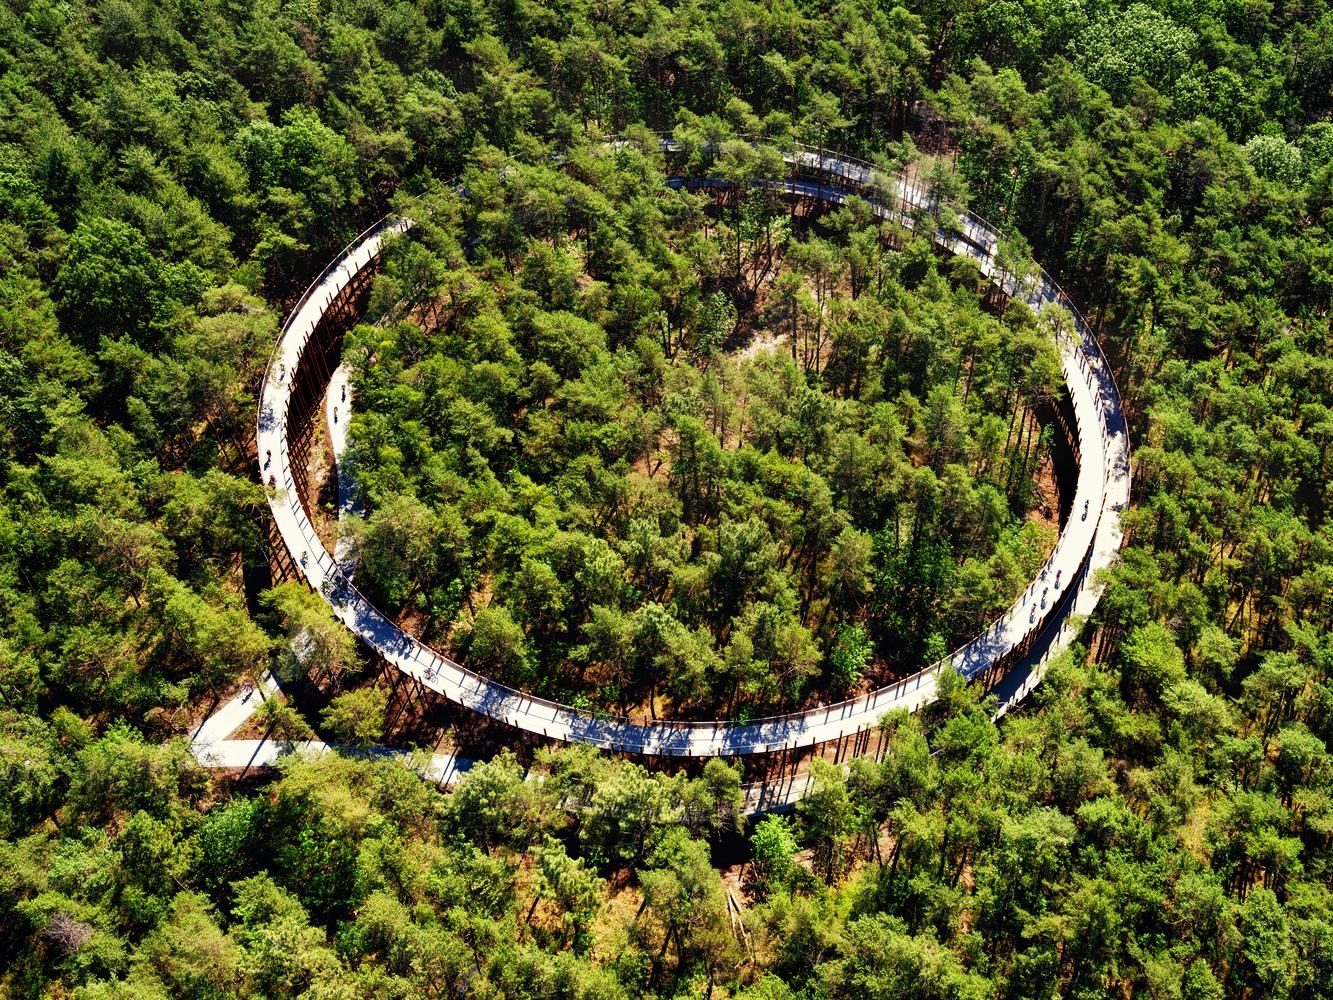 Cycling through the Trees / Burolandschap